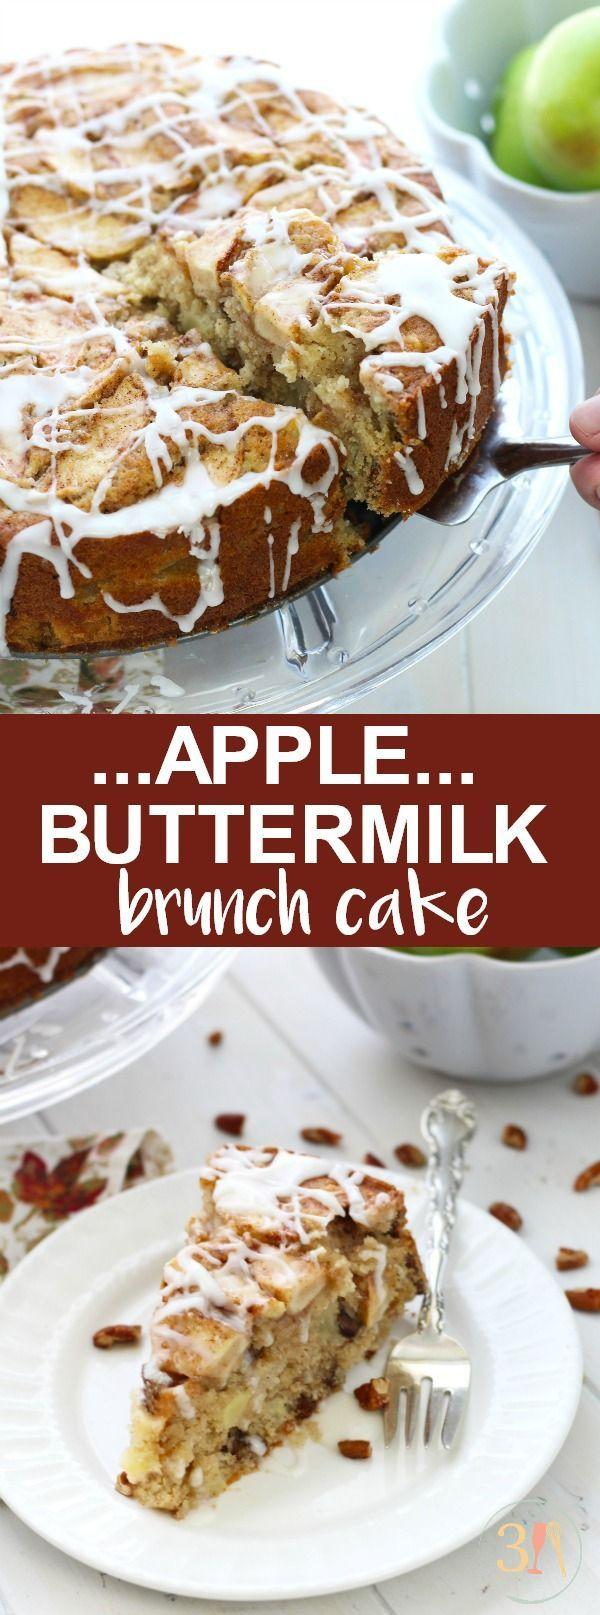 This Apple Buttermilk Brunch Cake has fresh Granny Smith apples ...